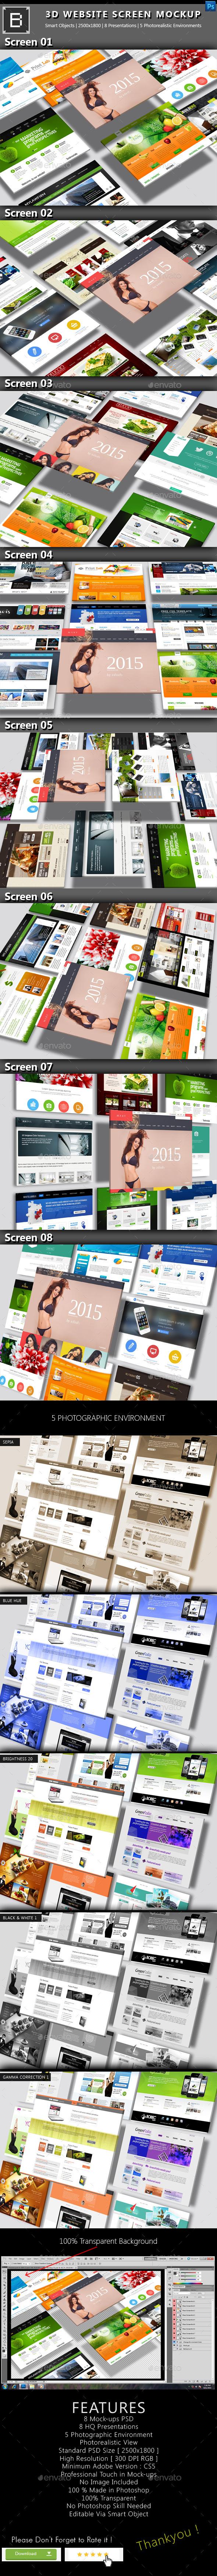 GraphicRiver 3D Website Screen Mockup 8922593